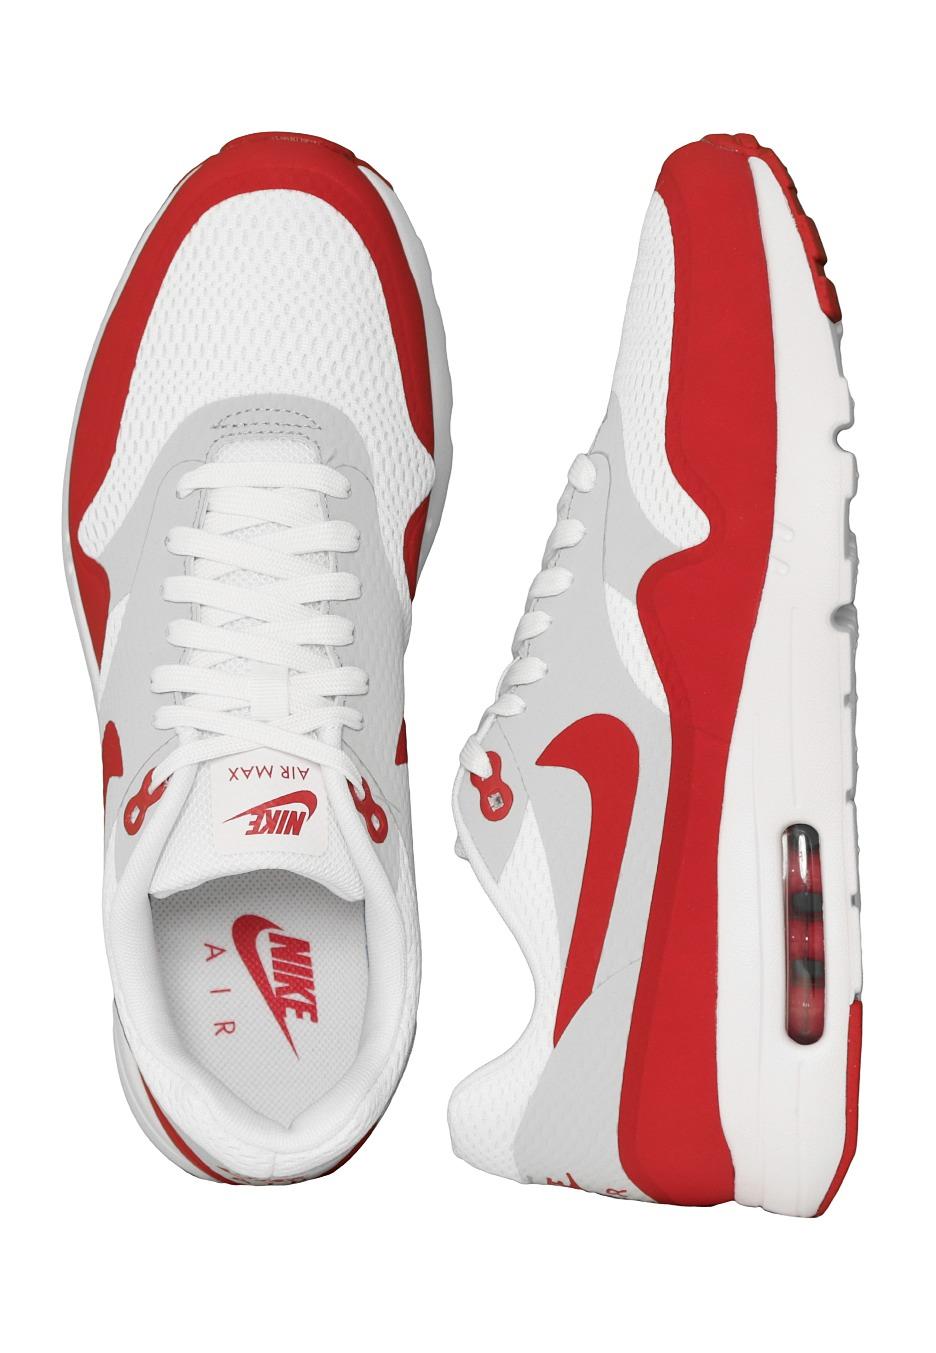 -18% Nike - Air Max 1 Ultra Essential White/Varsity Red/Neutral Grey/White